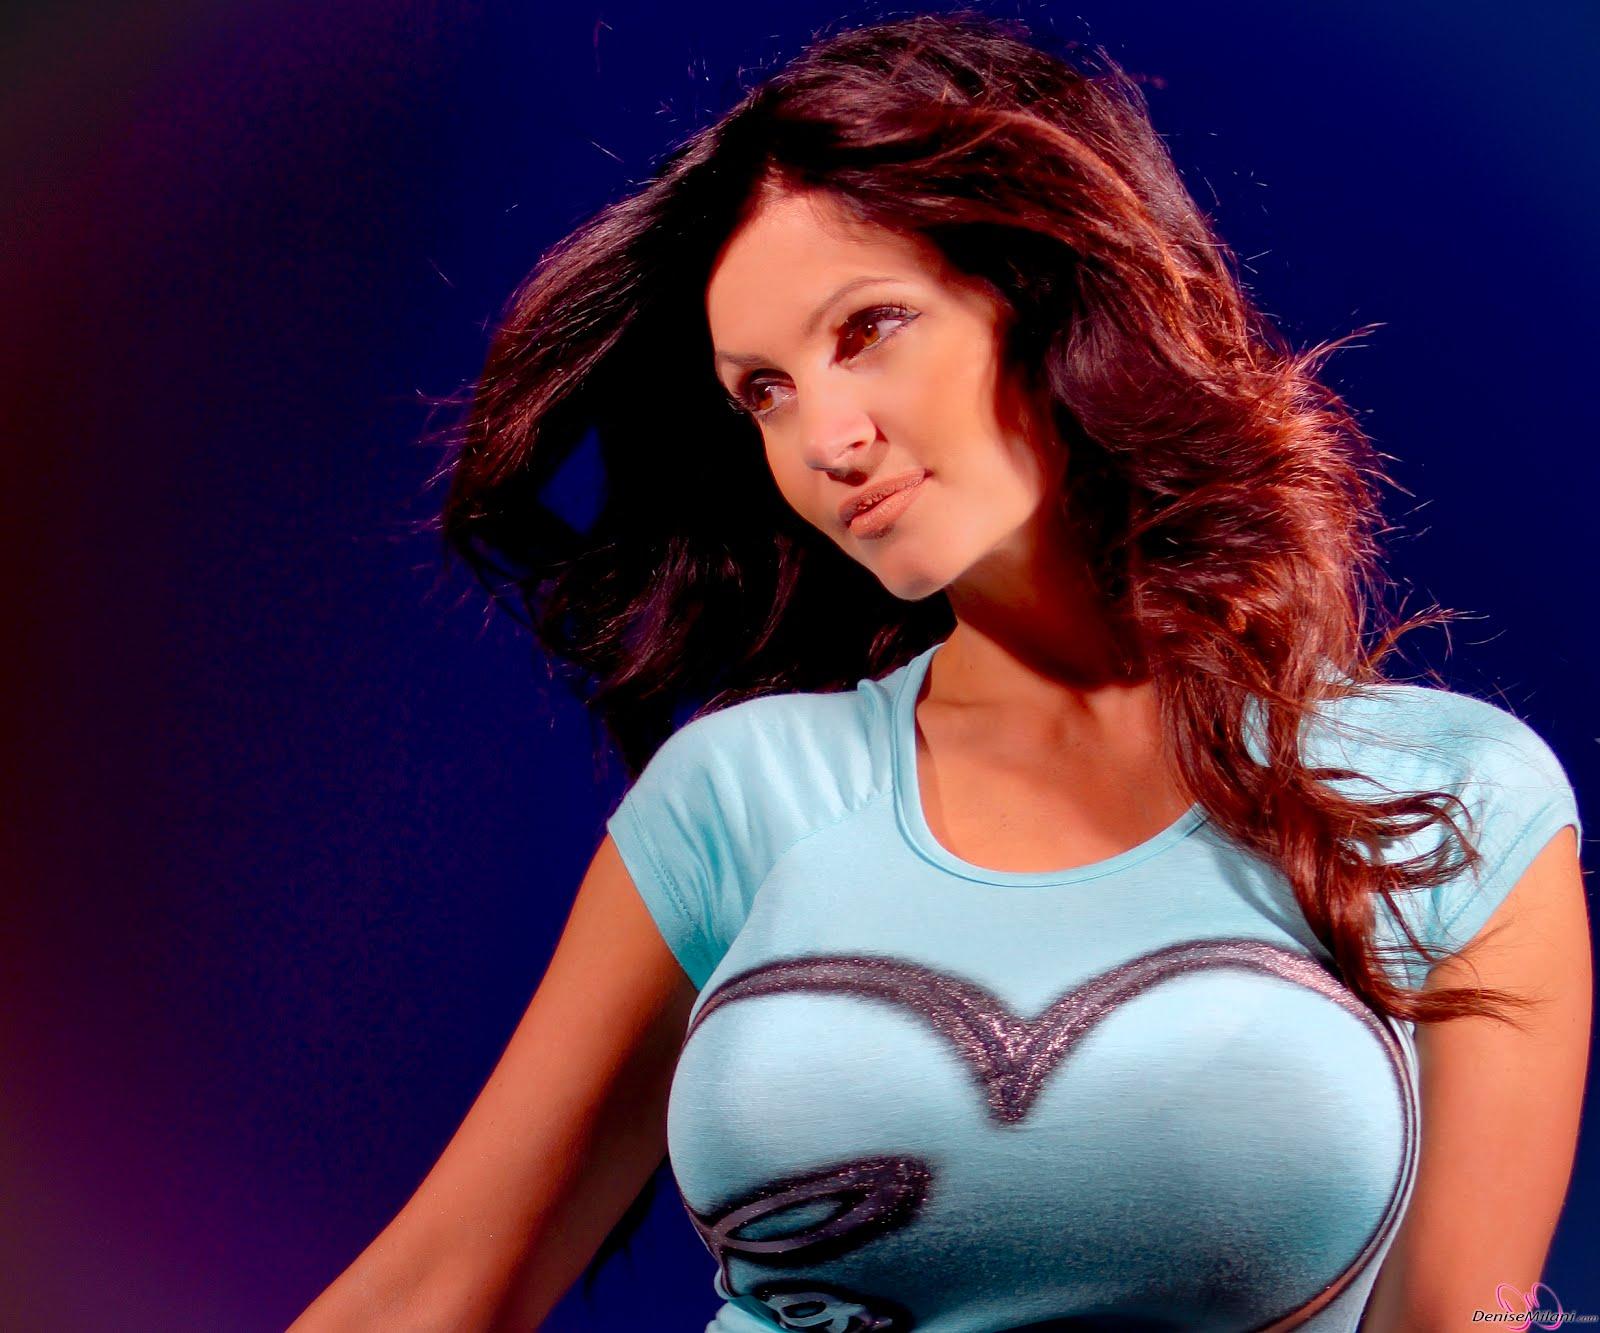 Denise Milani HD Photos In Blue Heart Dress